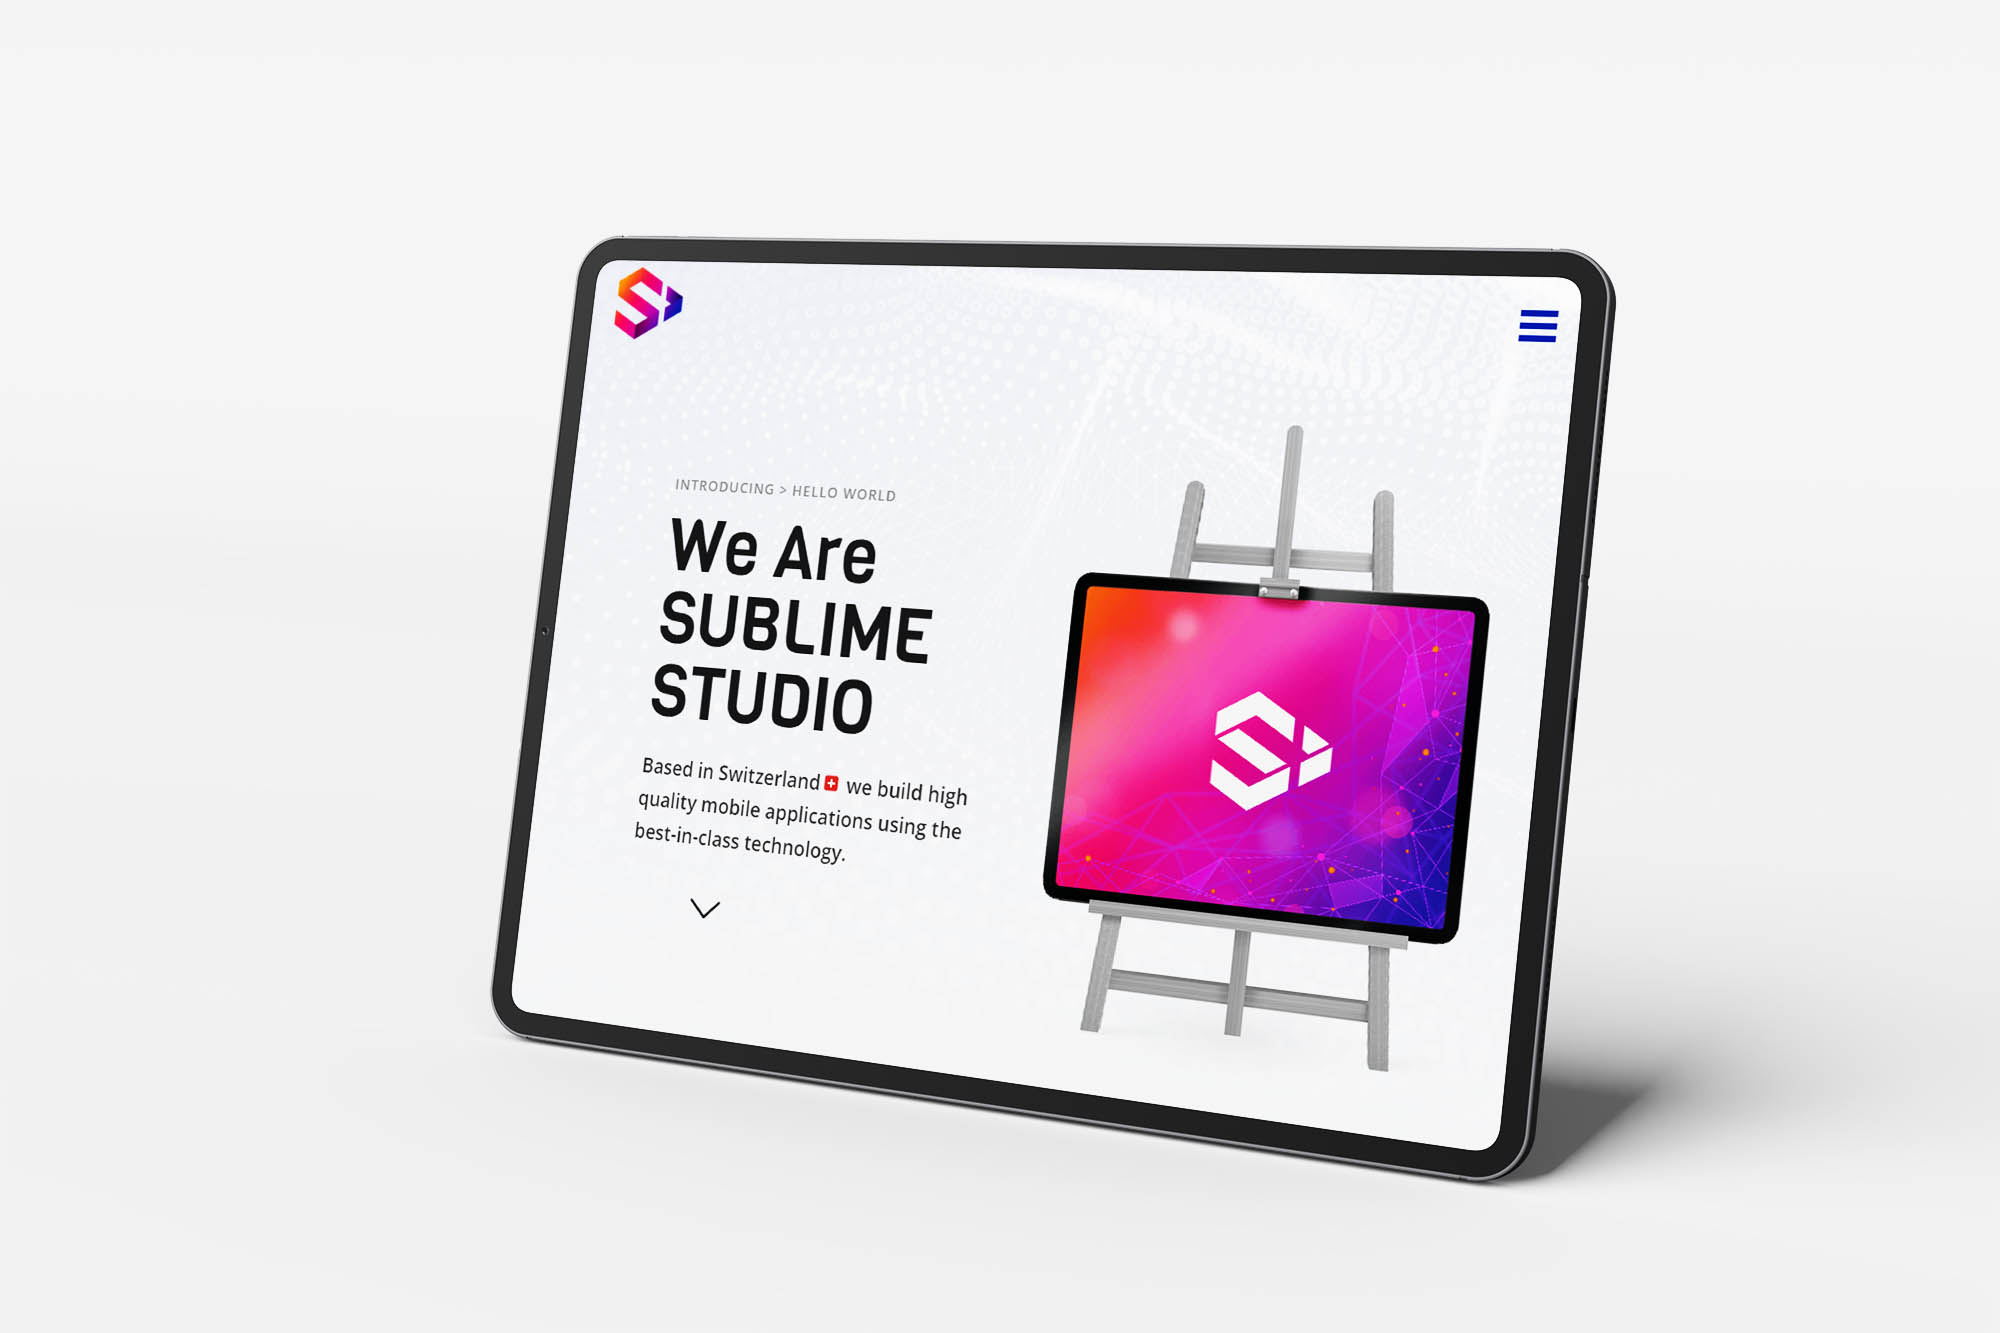 Sublime Studio, La otra comunicacion, Branding, Diseño web, Logotipo, Diseño